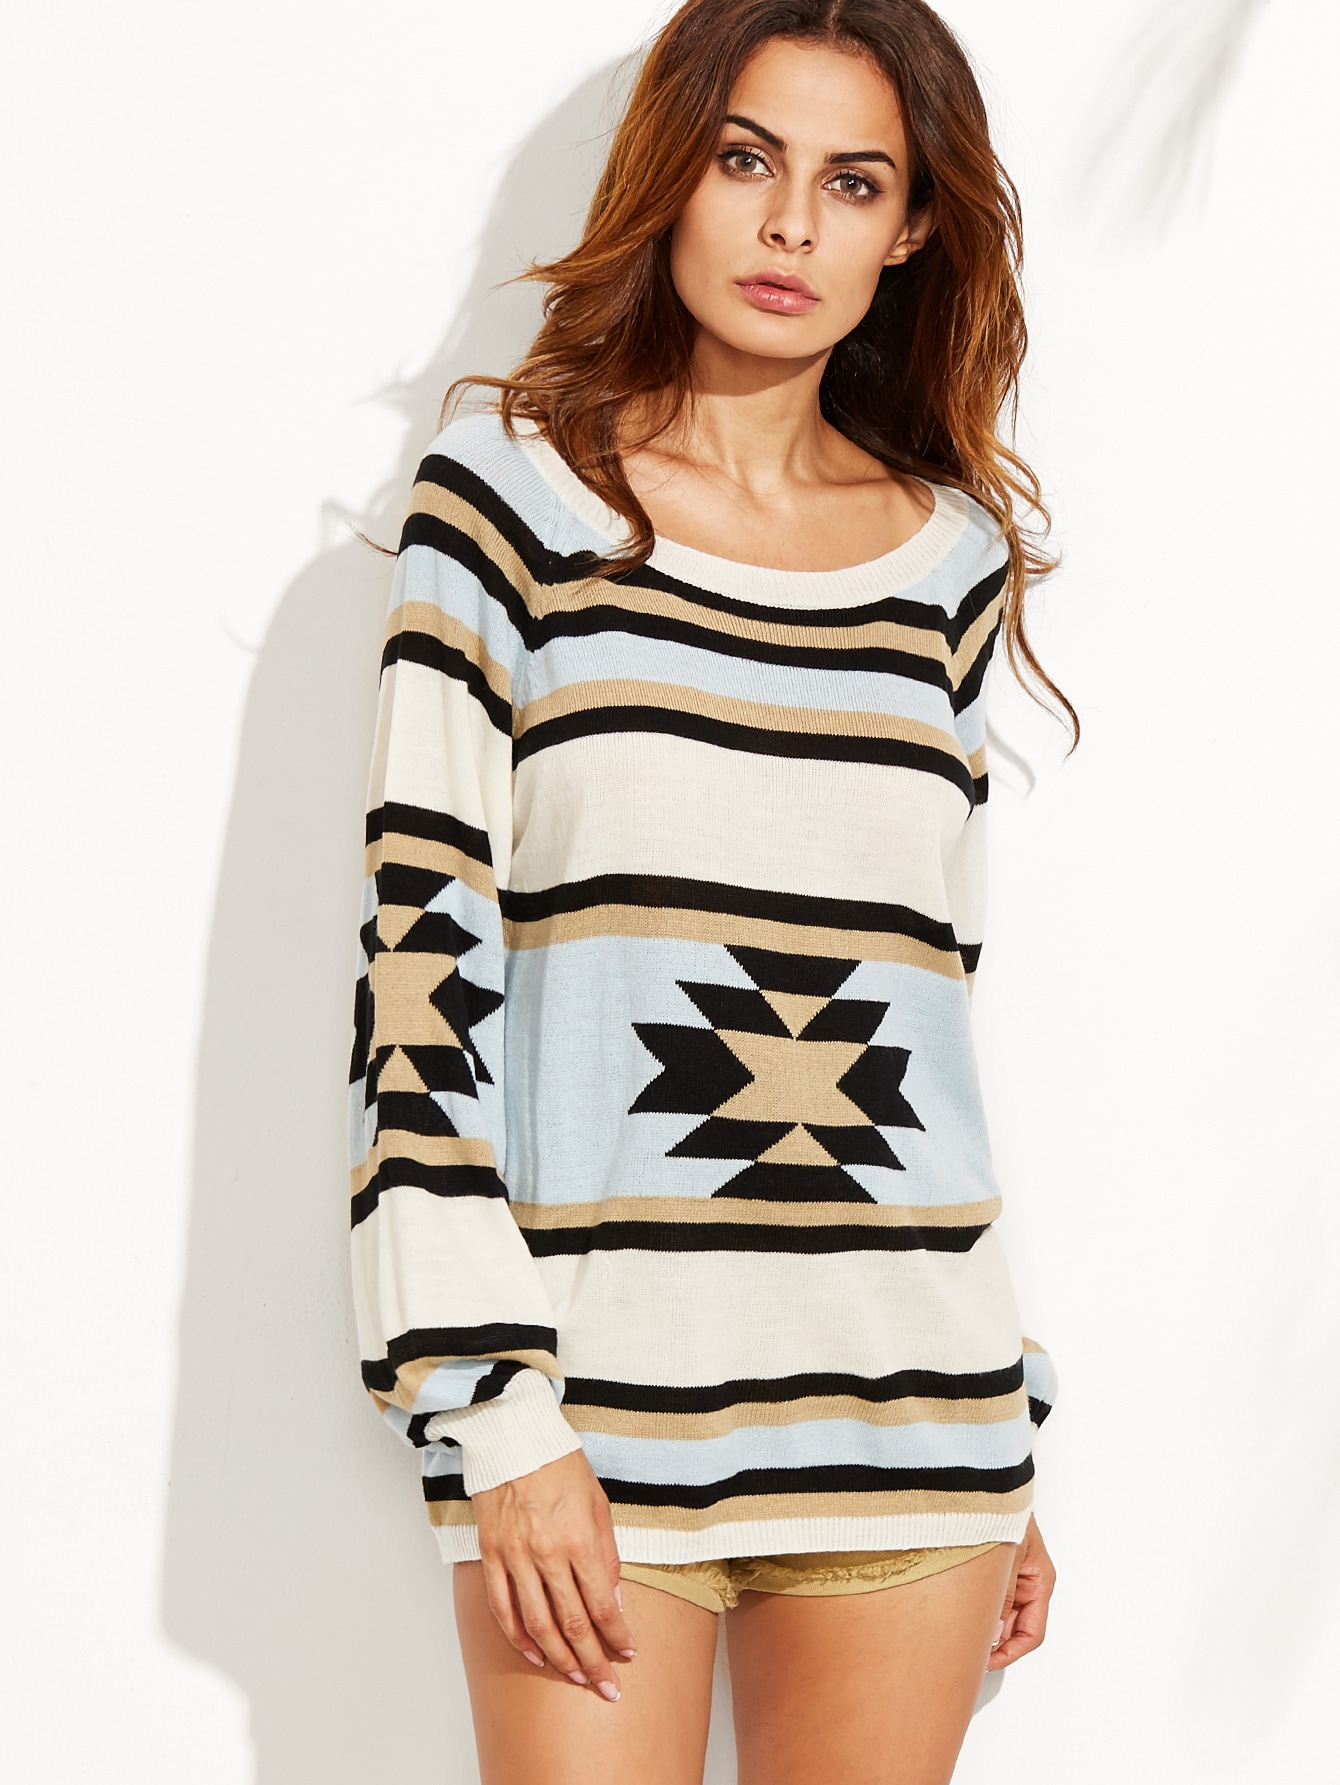 sweater160816706_2